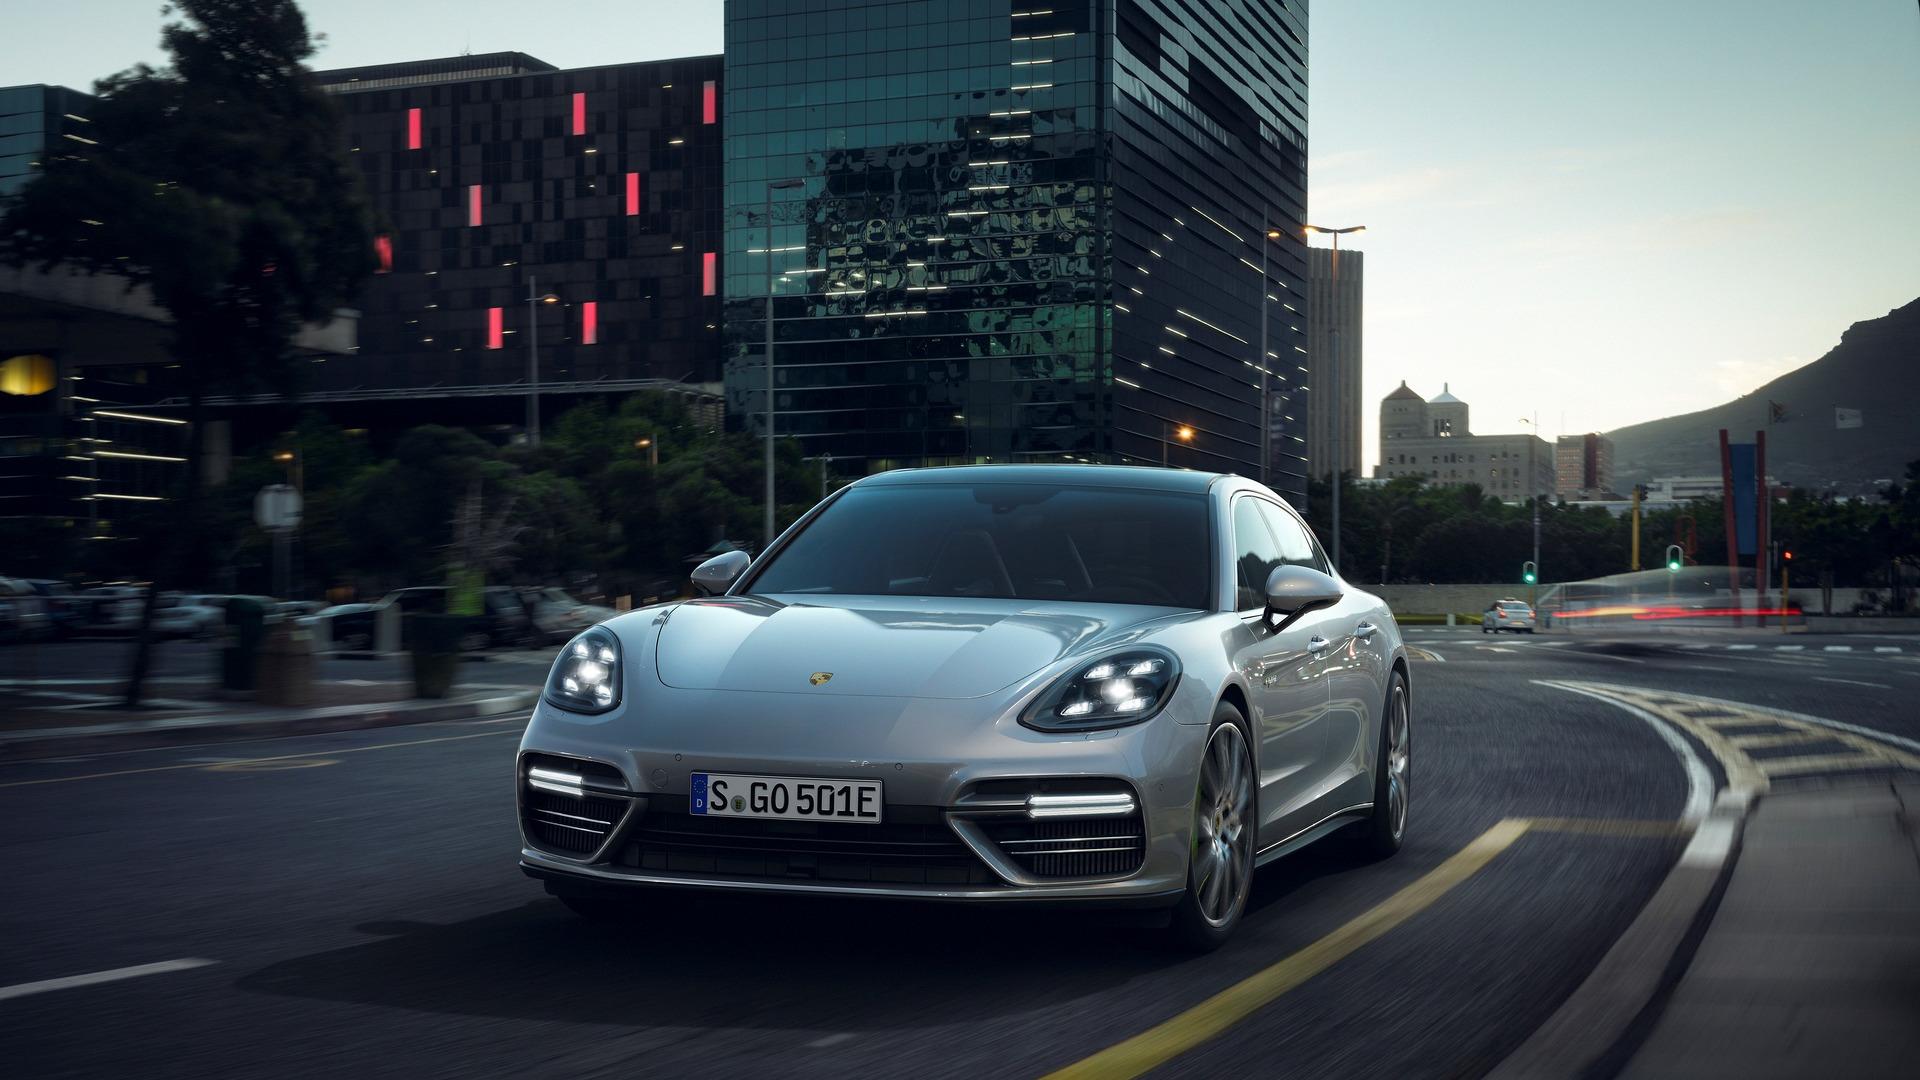 Interface-Porsche-Panamera-S-E-Hybrid-2018